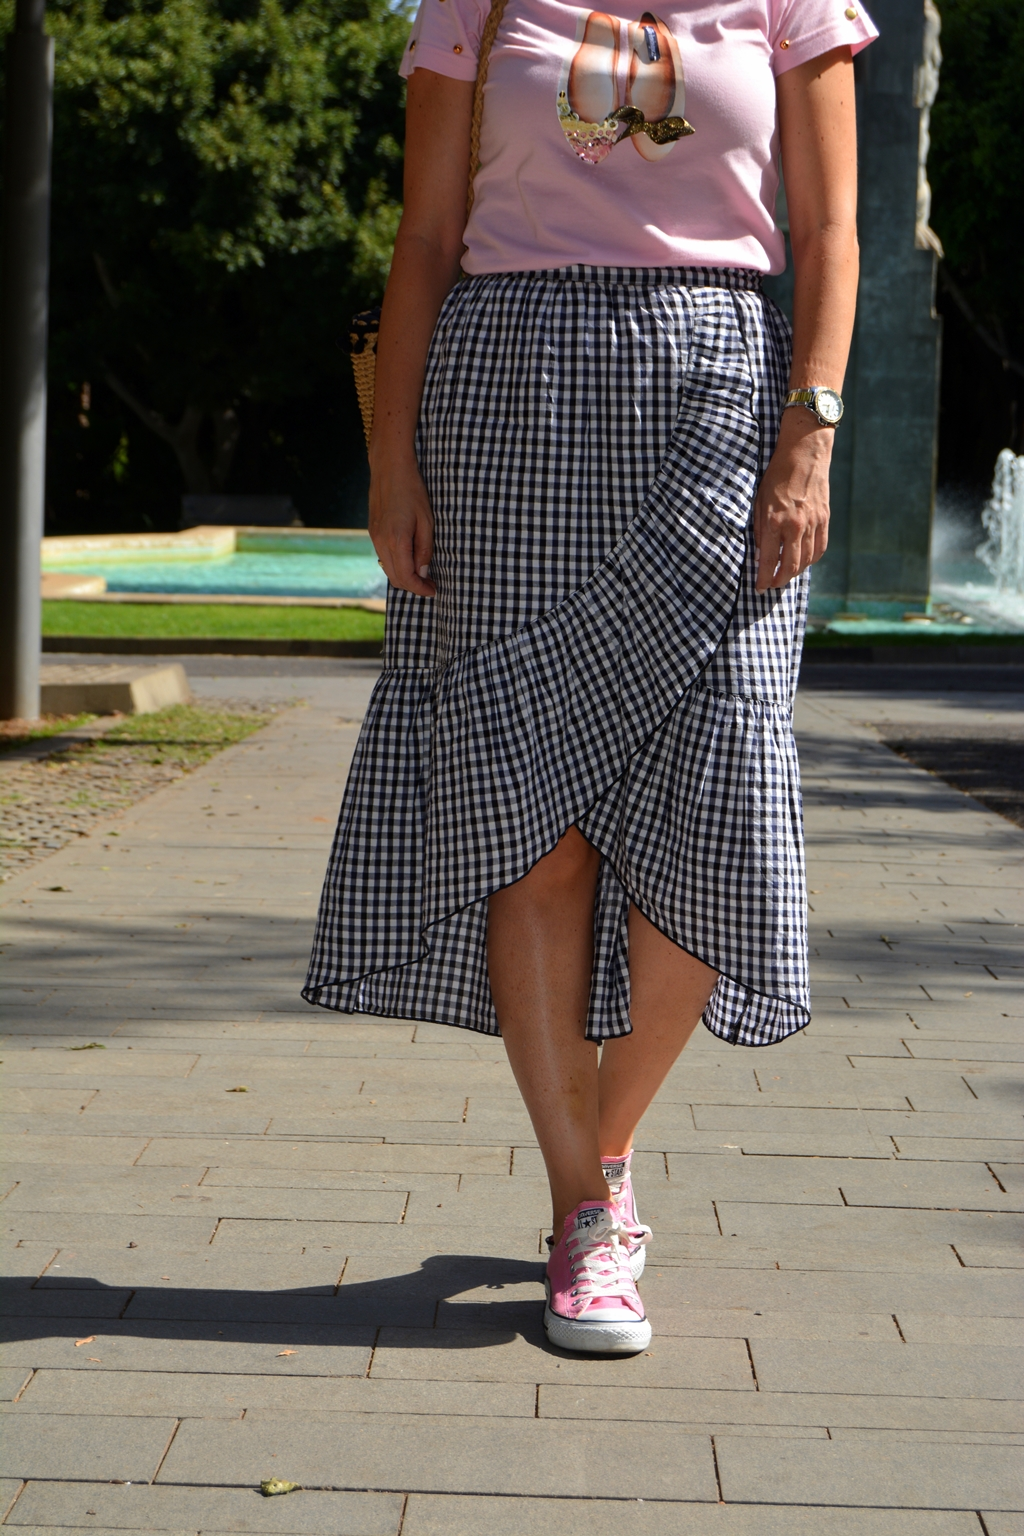 arcadinas-t-shirt-vivhy-falda-converse-look